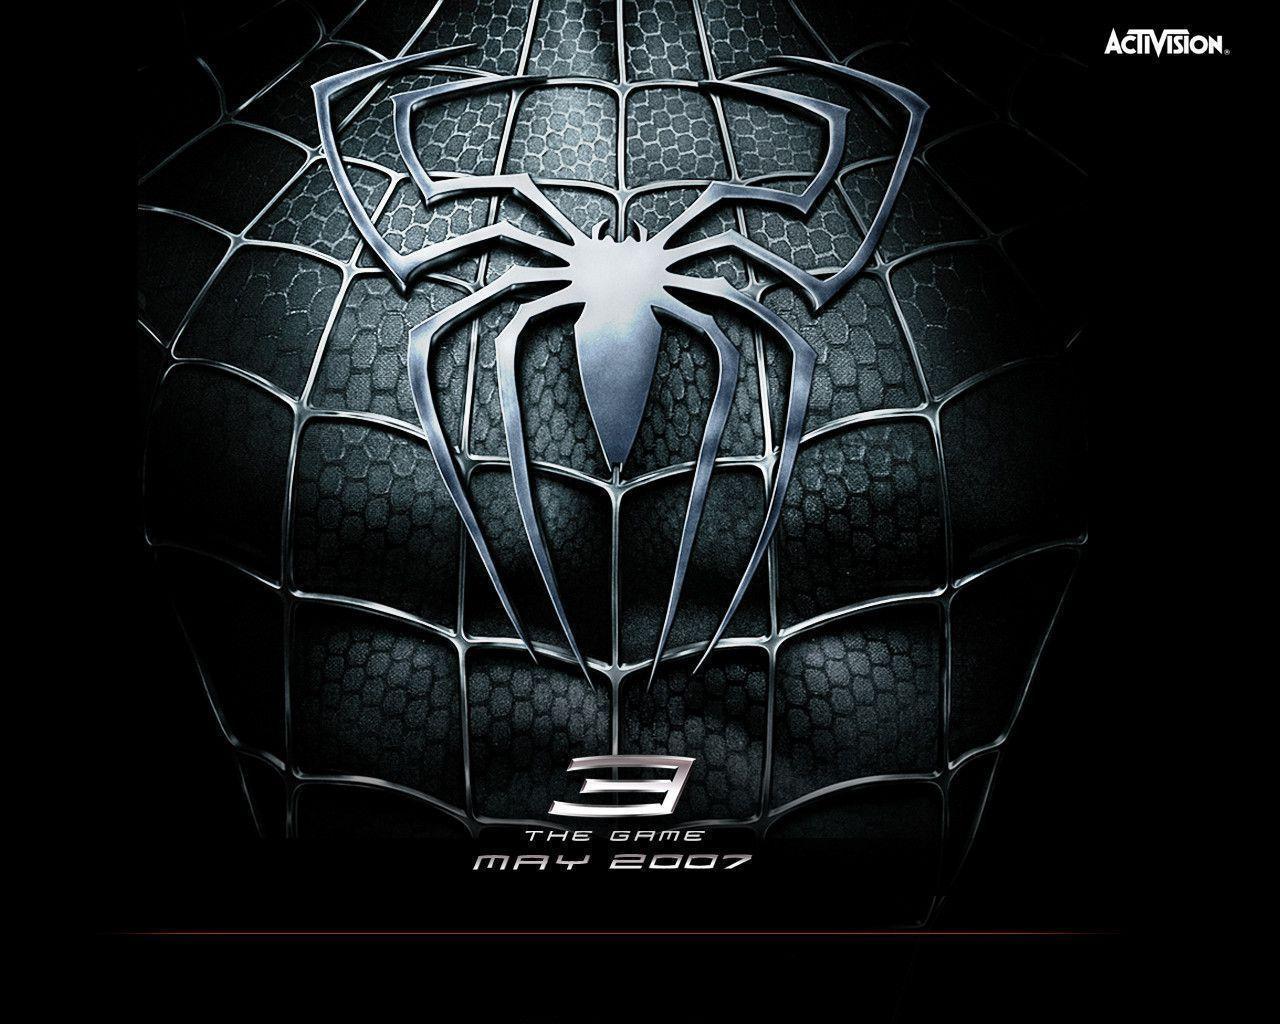 spiderman 3 wallpapers wallpaper cave